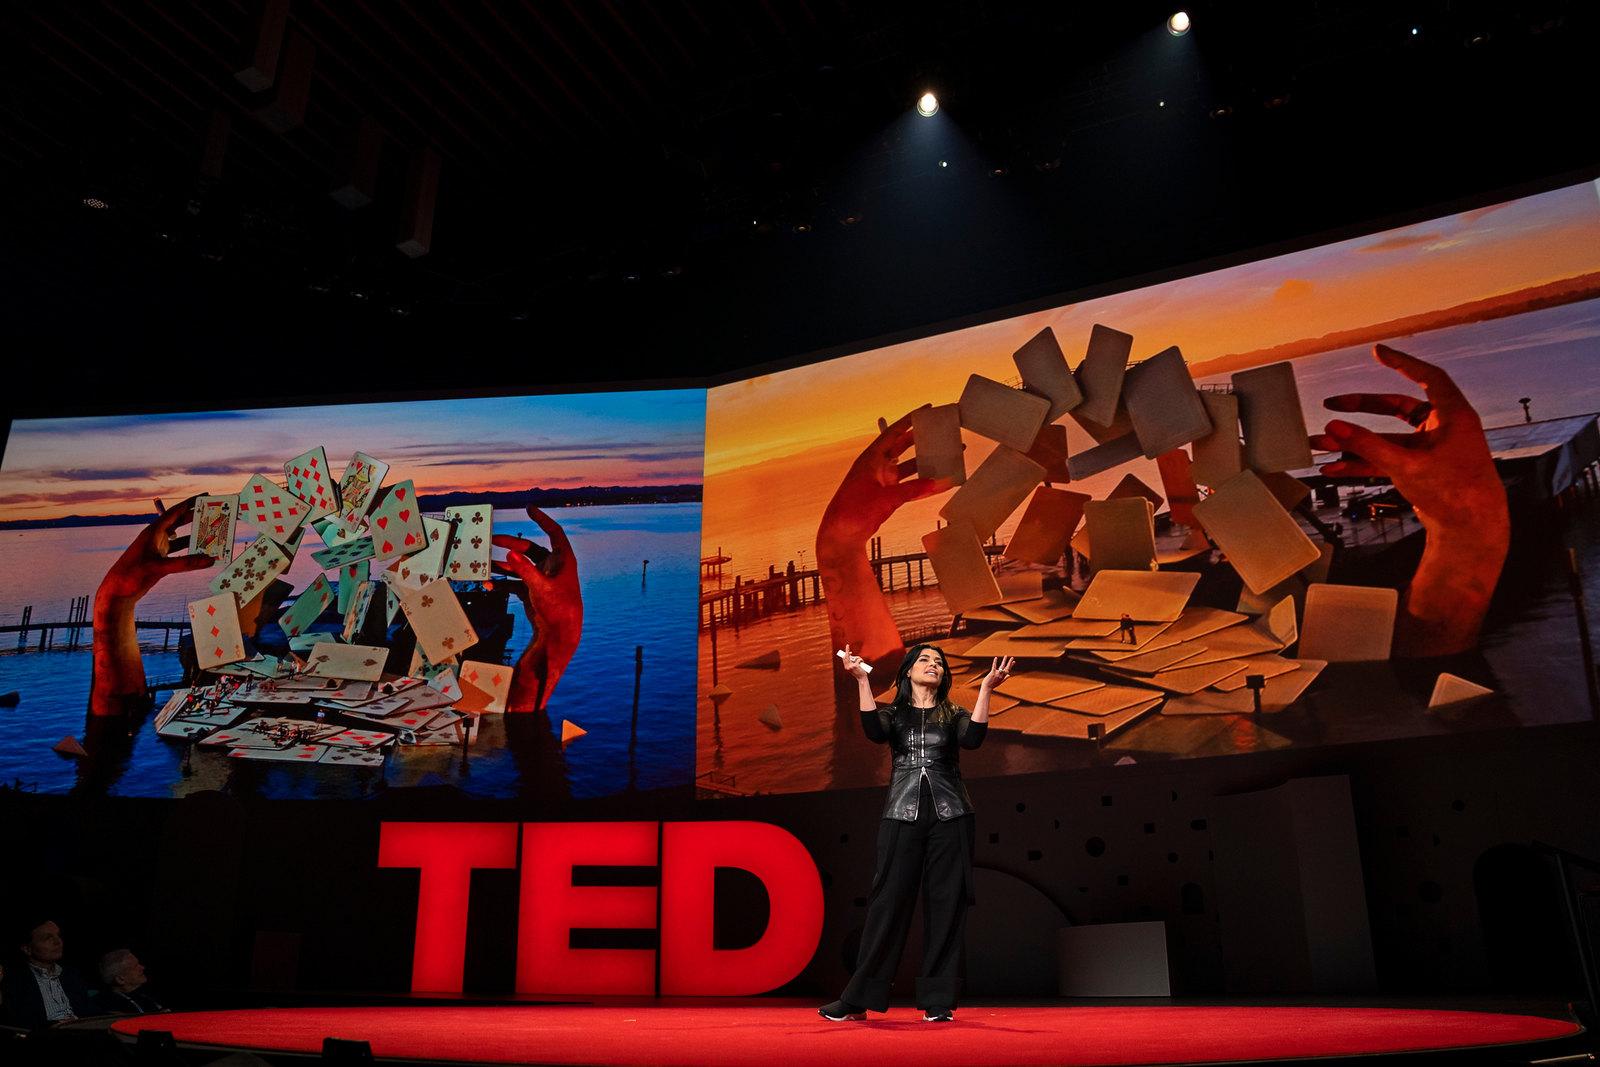 TED2019: Bigger than us | April 15-19, 2019 | Vancouver, BC, Canada